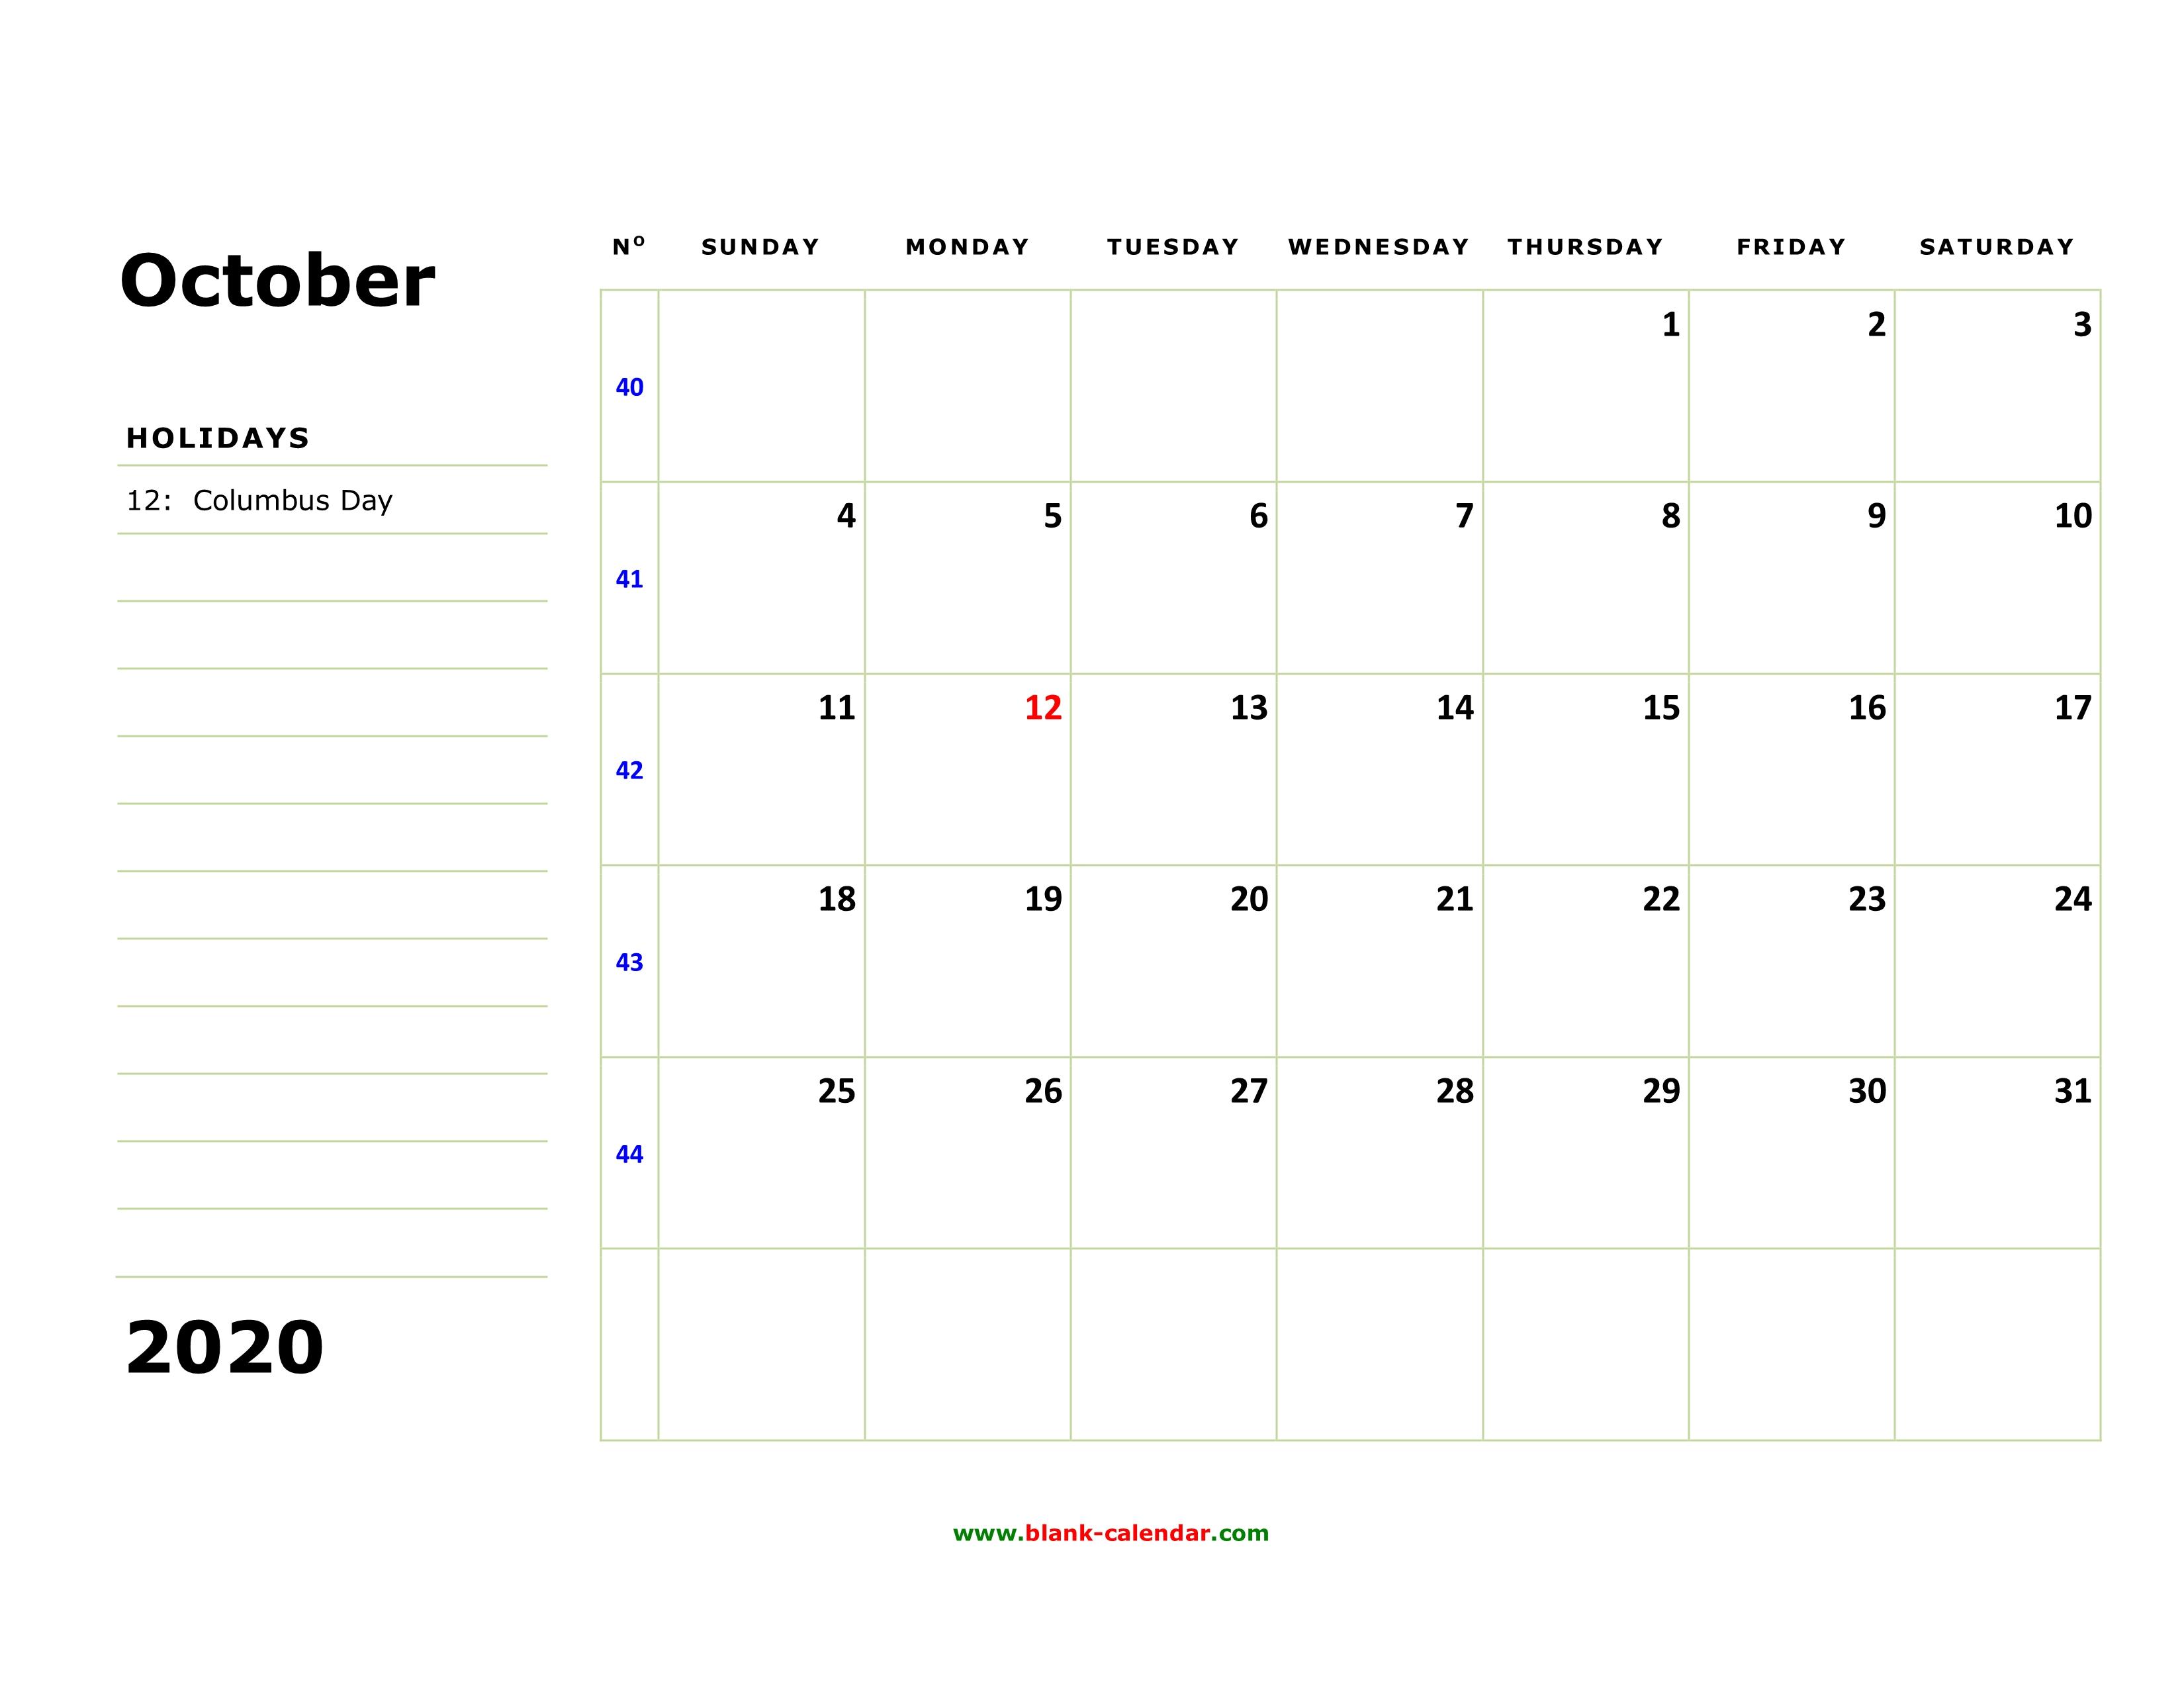 October 2020 Printable Calendar.Free Download Printable October 2020 Calendar Large Box Holidays